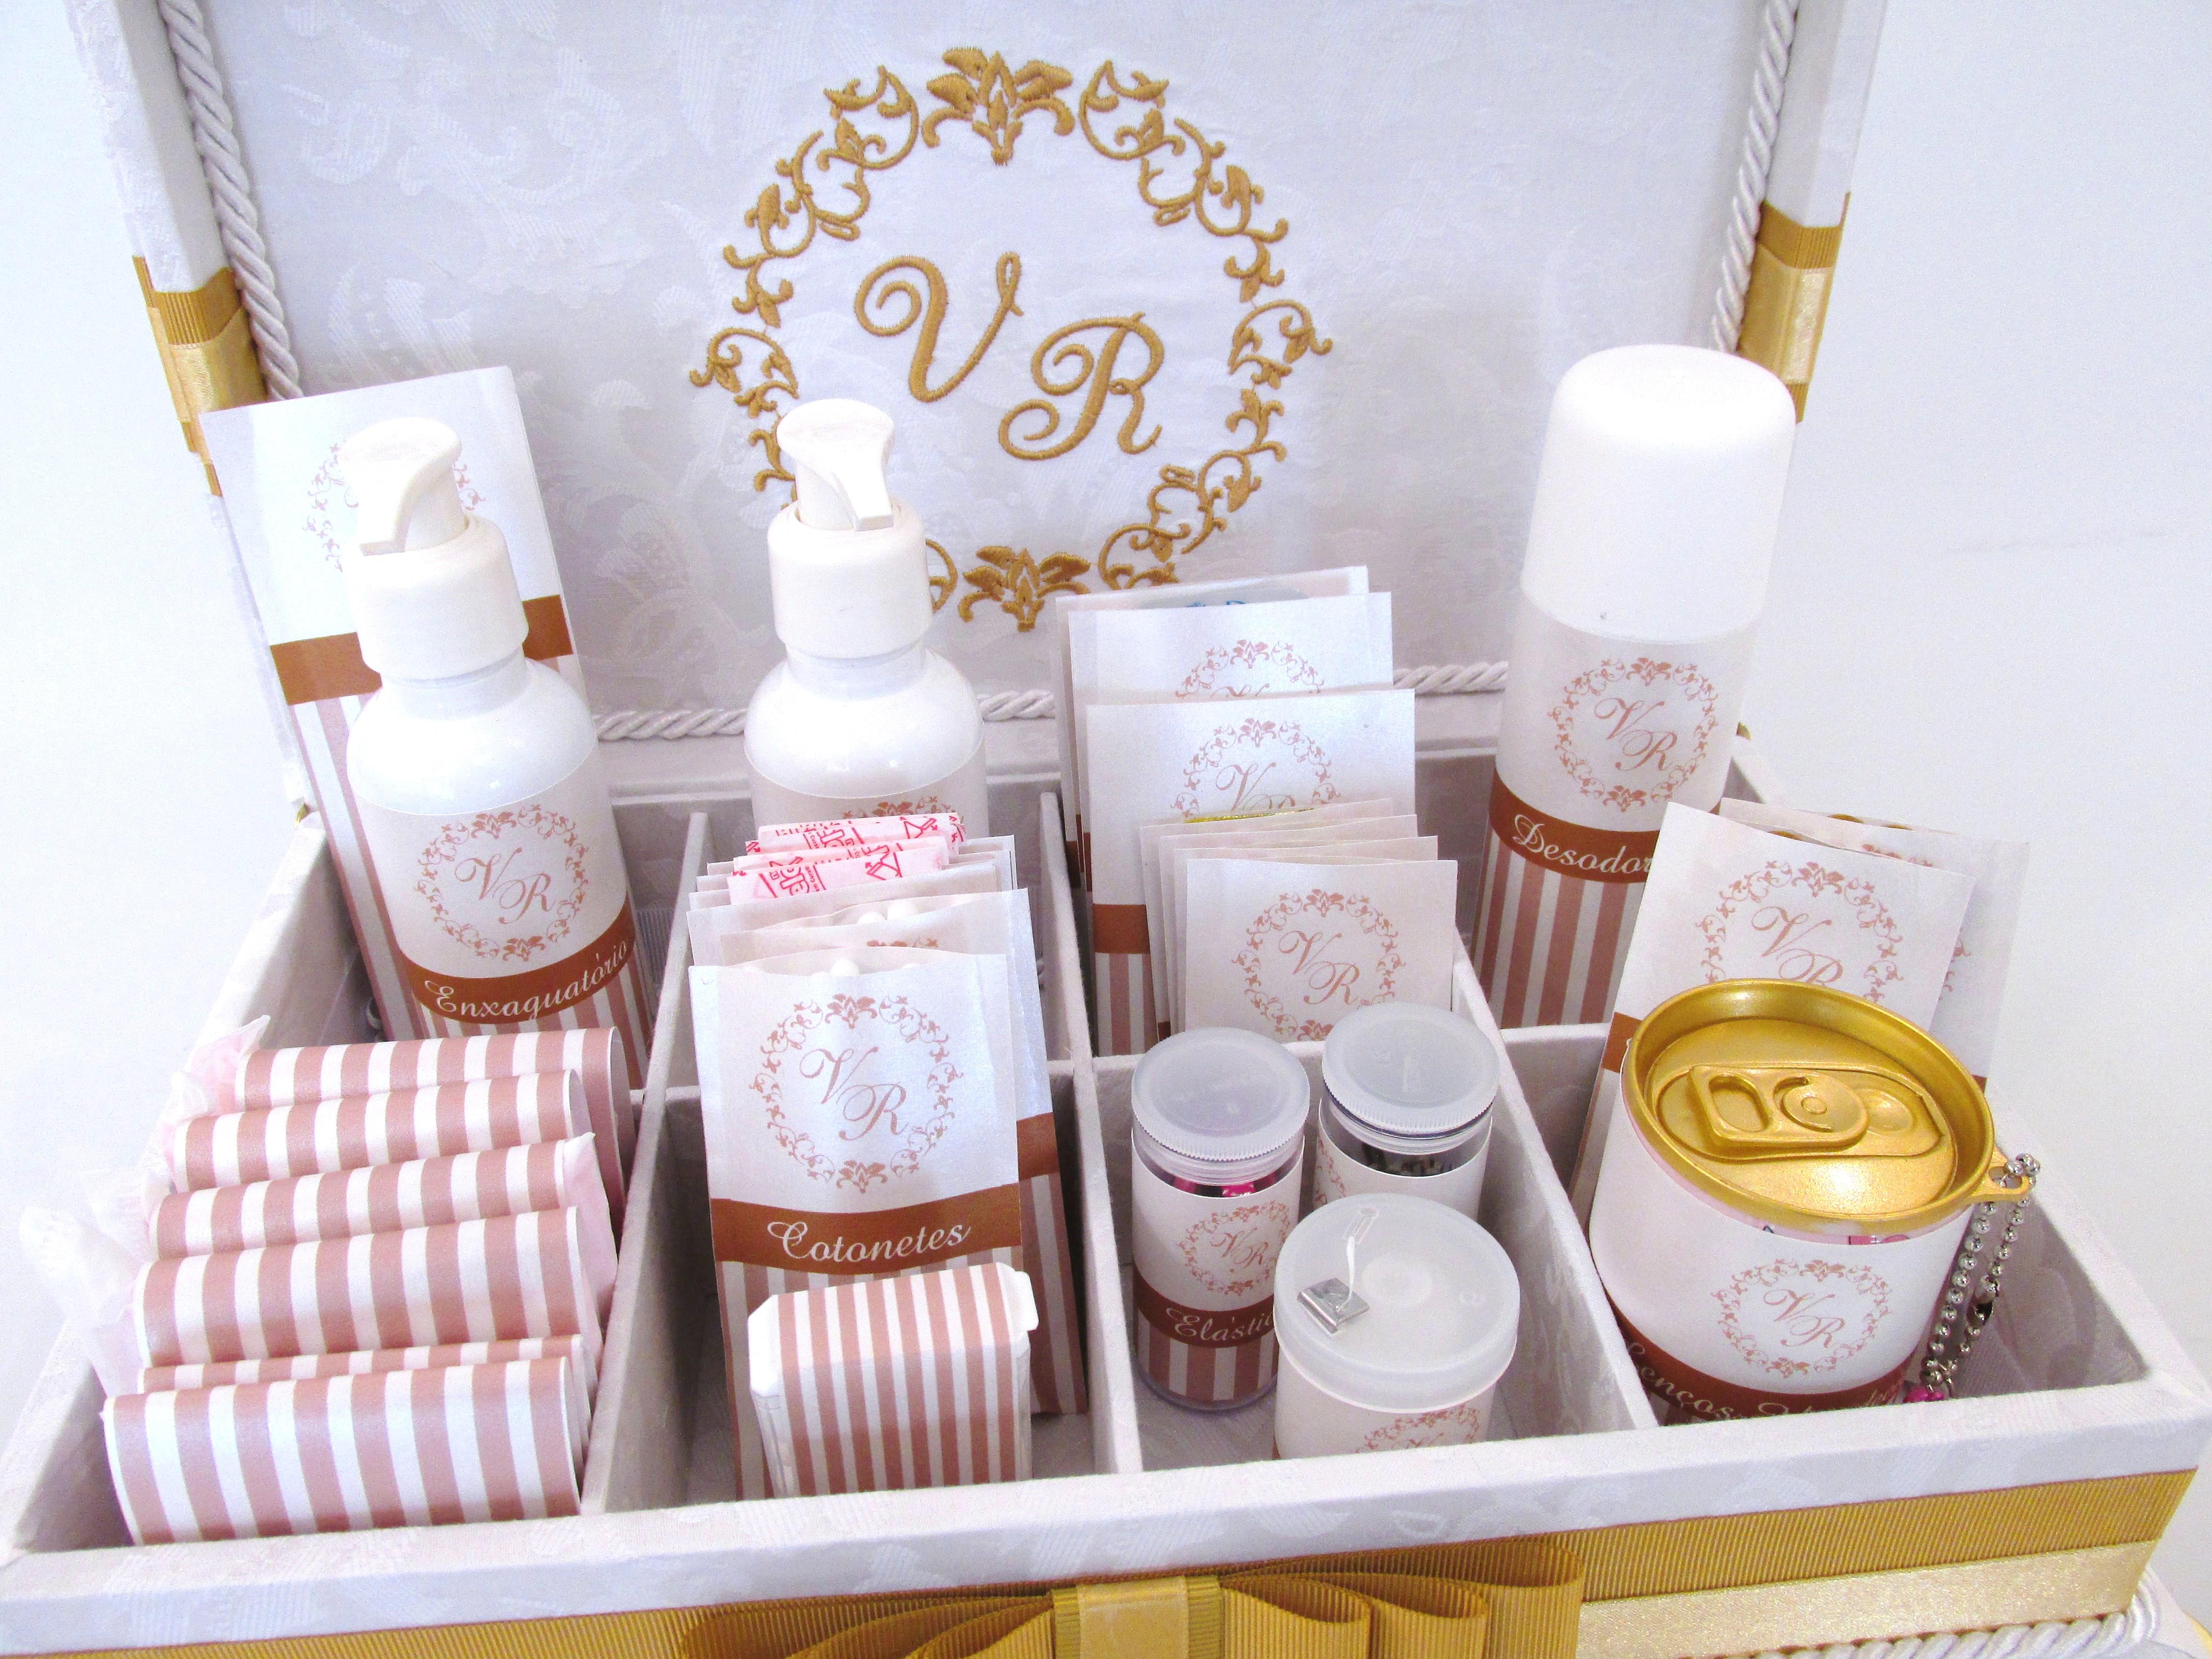 Milene Novaes Cerimonial Kit Toilette Faca Voce Mesma